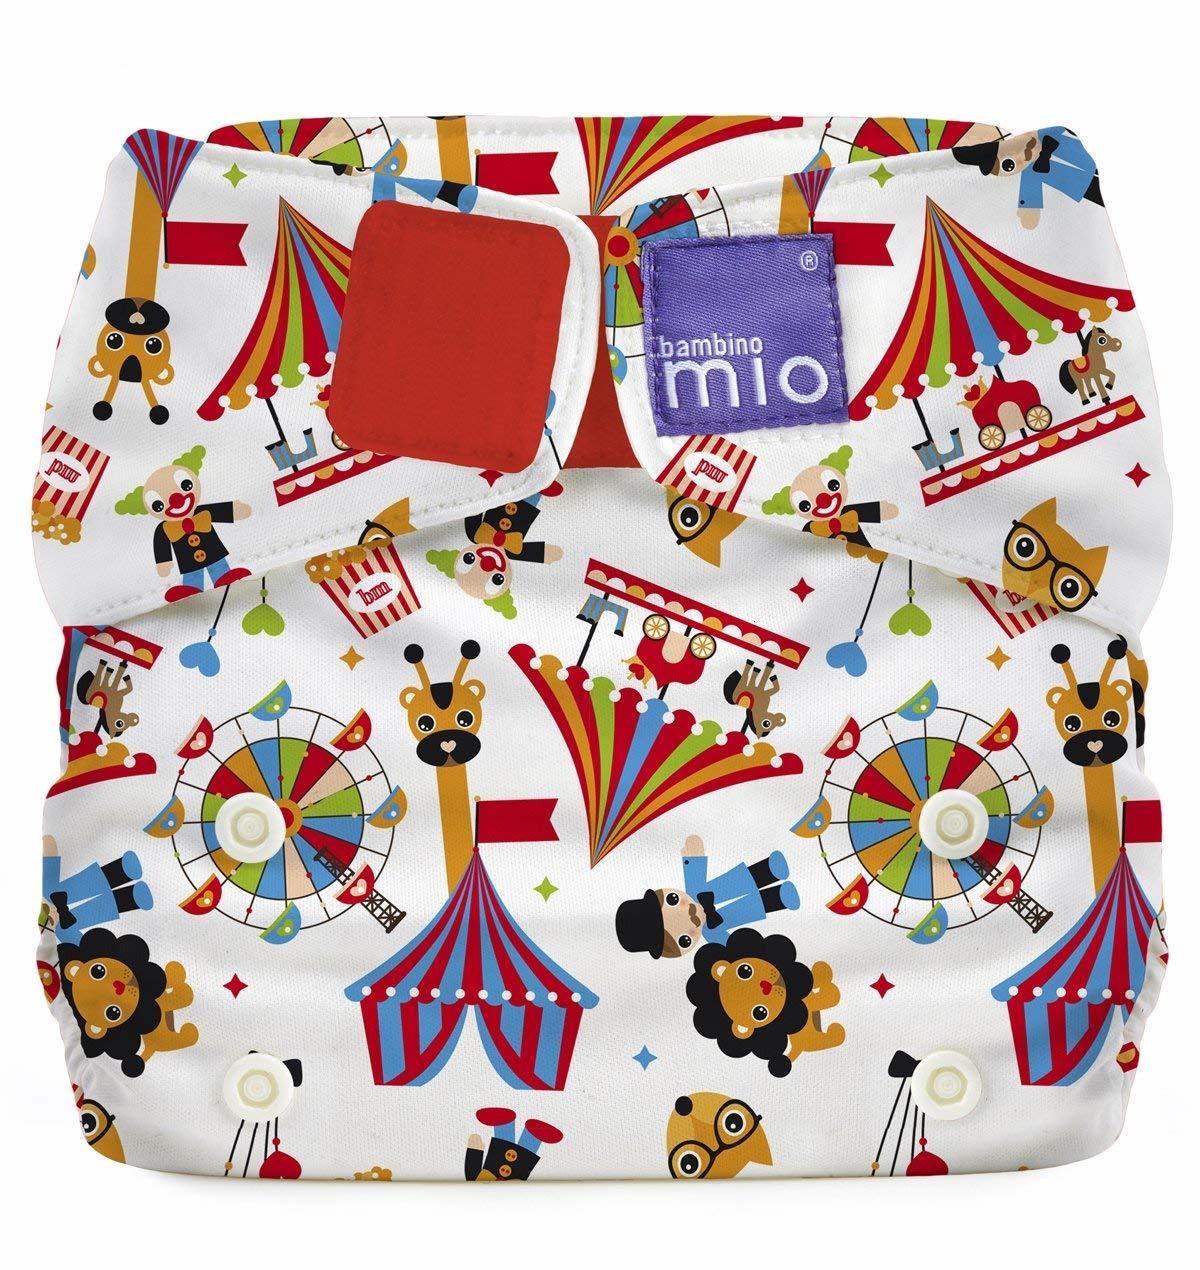 Bambino Mio: Miosolo All-in-One Nappy - Circus image